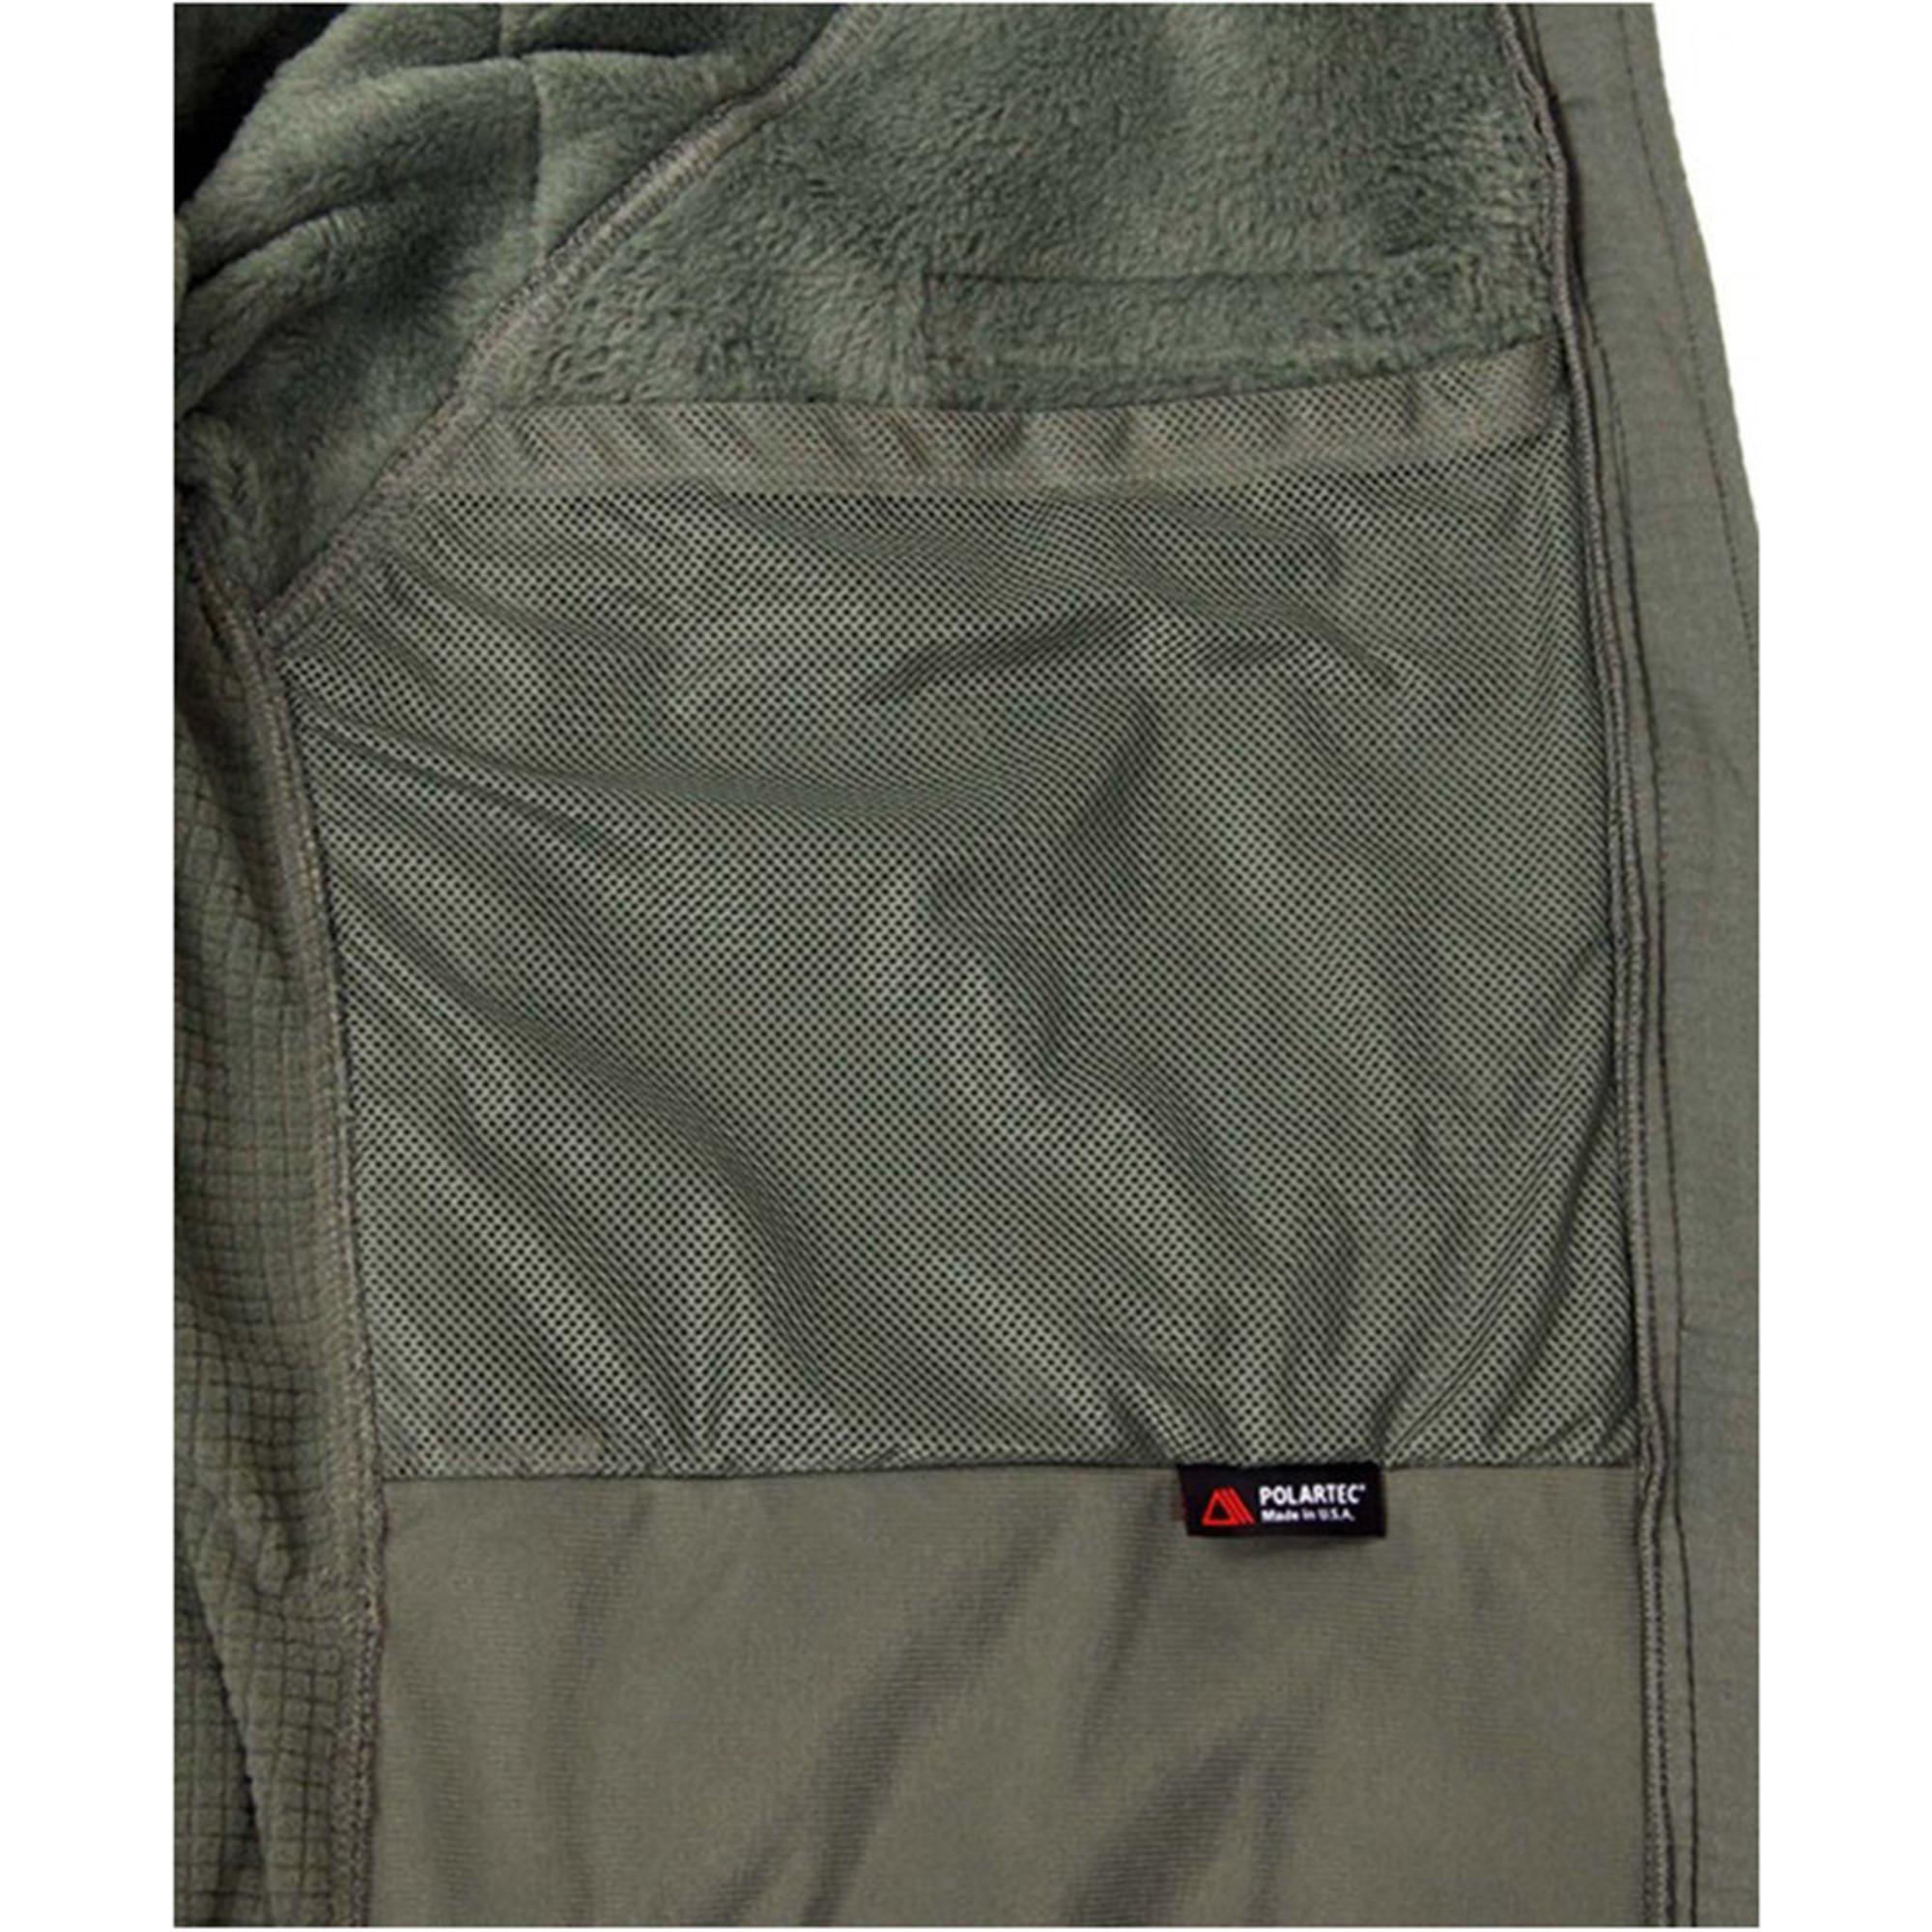 Propper Gen III Lightweight Polartec Thermal Fleece Jacket For Military Parka